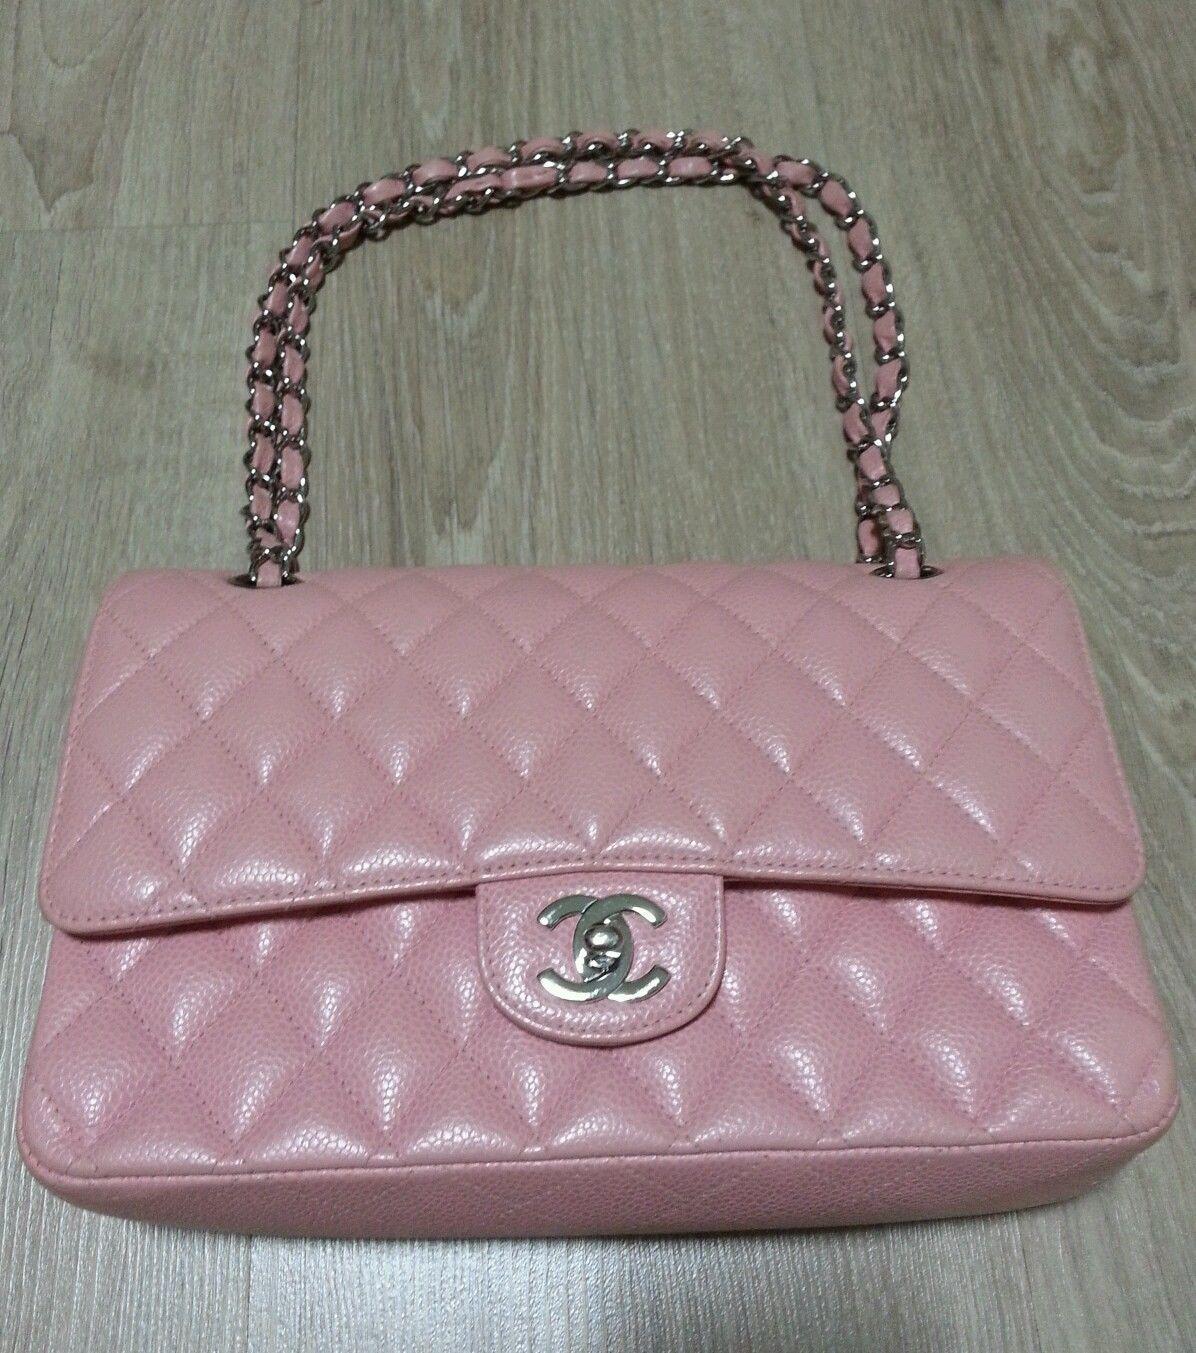 3f05fb266e21 Authentic Classic Chanel Pink Caviar Medium Silver HW Double Flap Bag